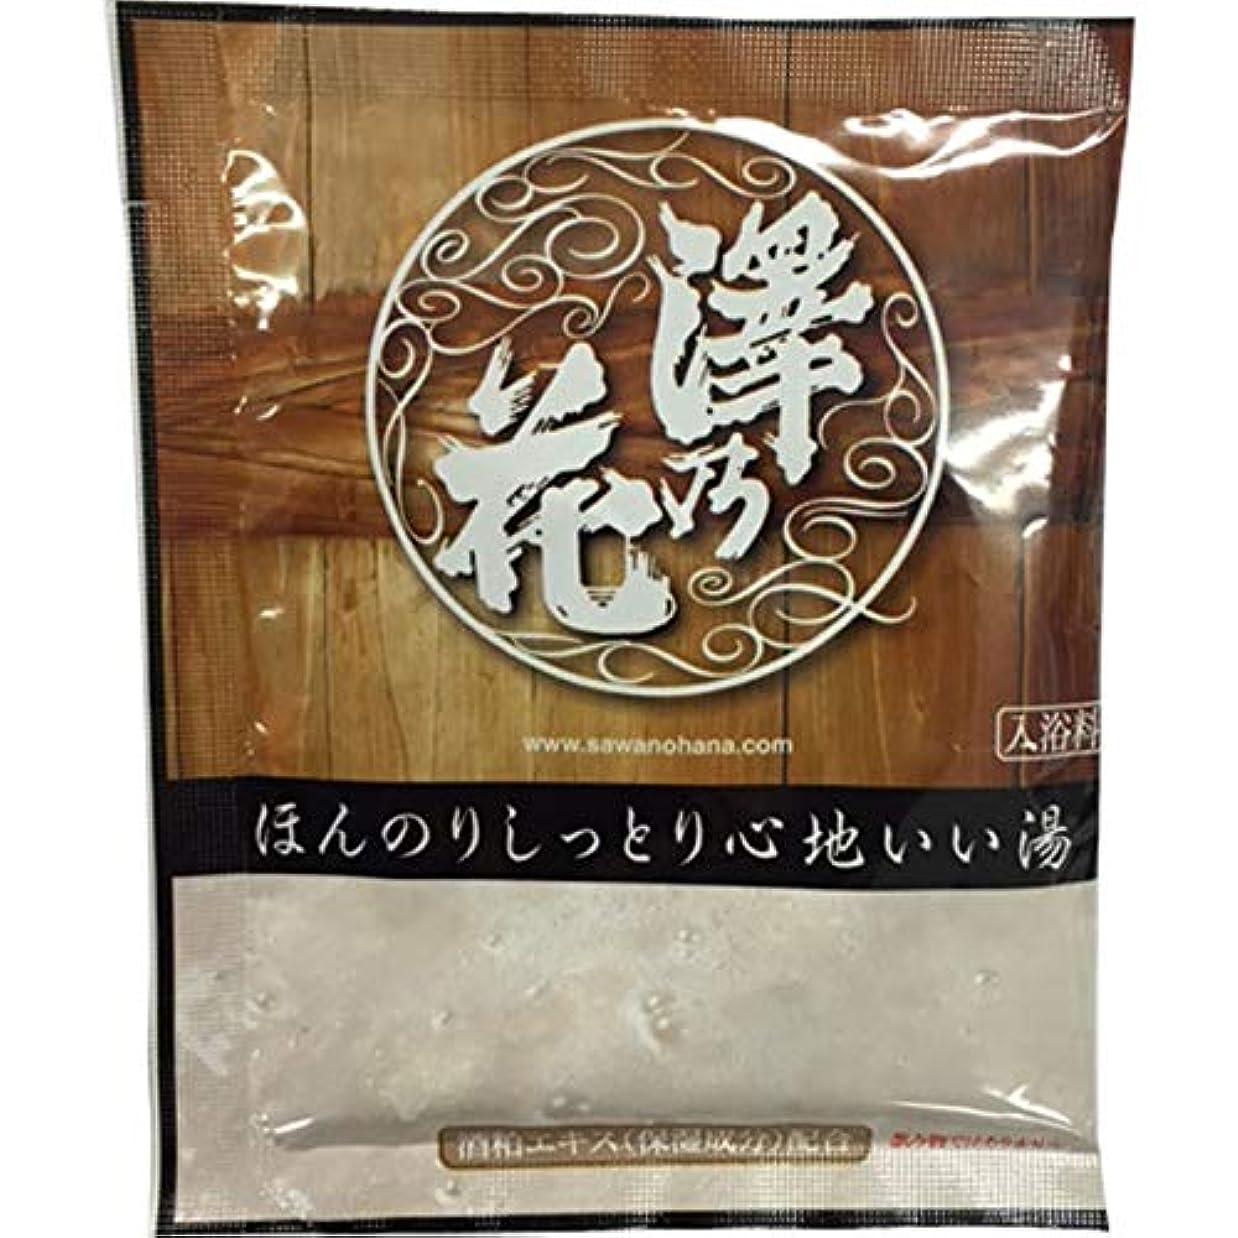 ミルク維持する連帯日本生化学 澤乃花 酒粕入浴料 25G